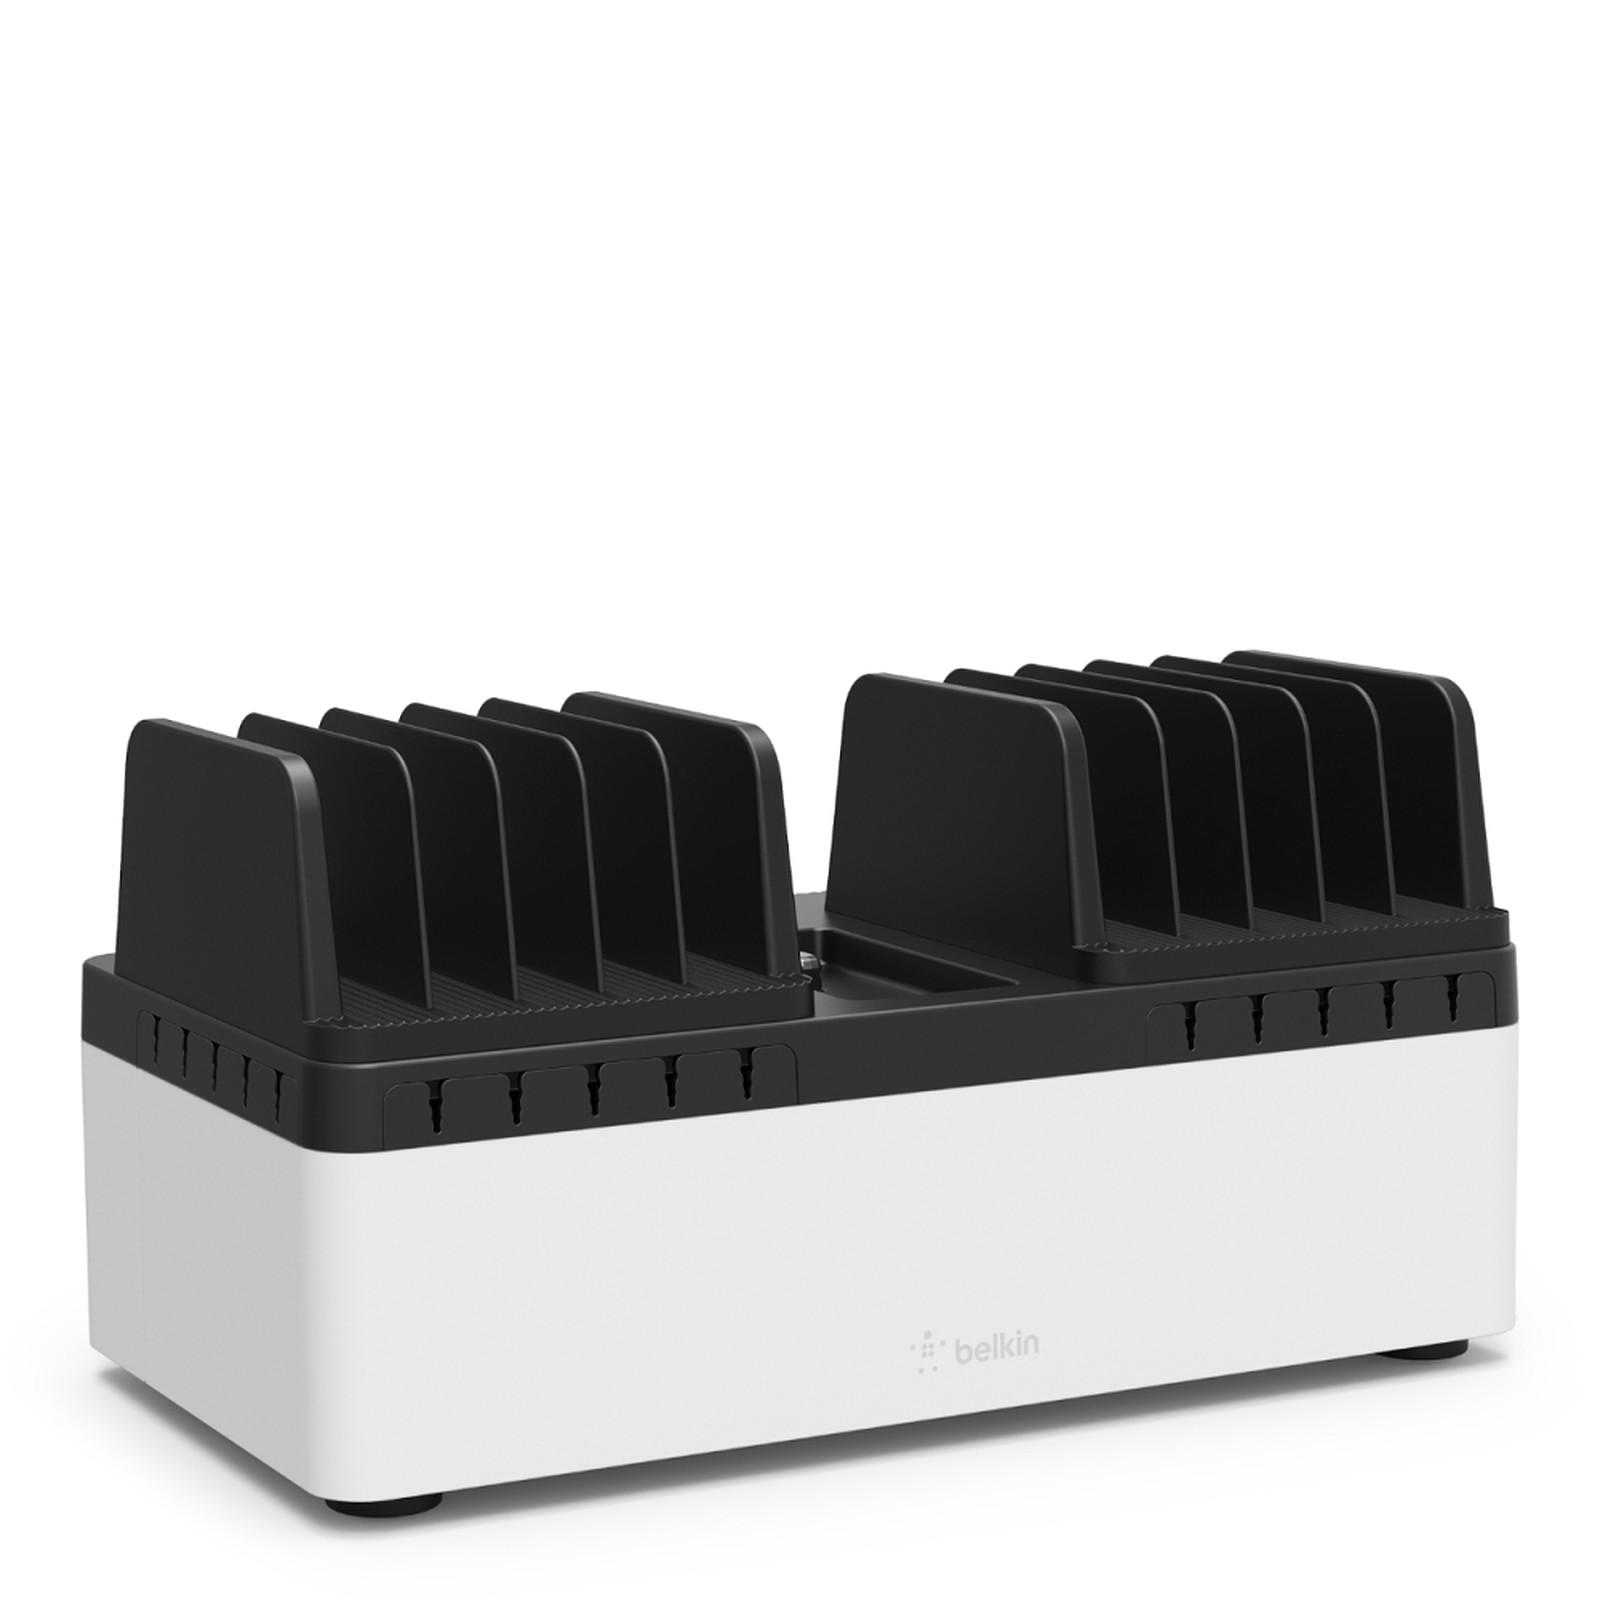 Belkin Store and Charge Go + RockStar avec compartiments de rangement fixes